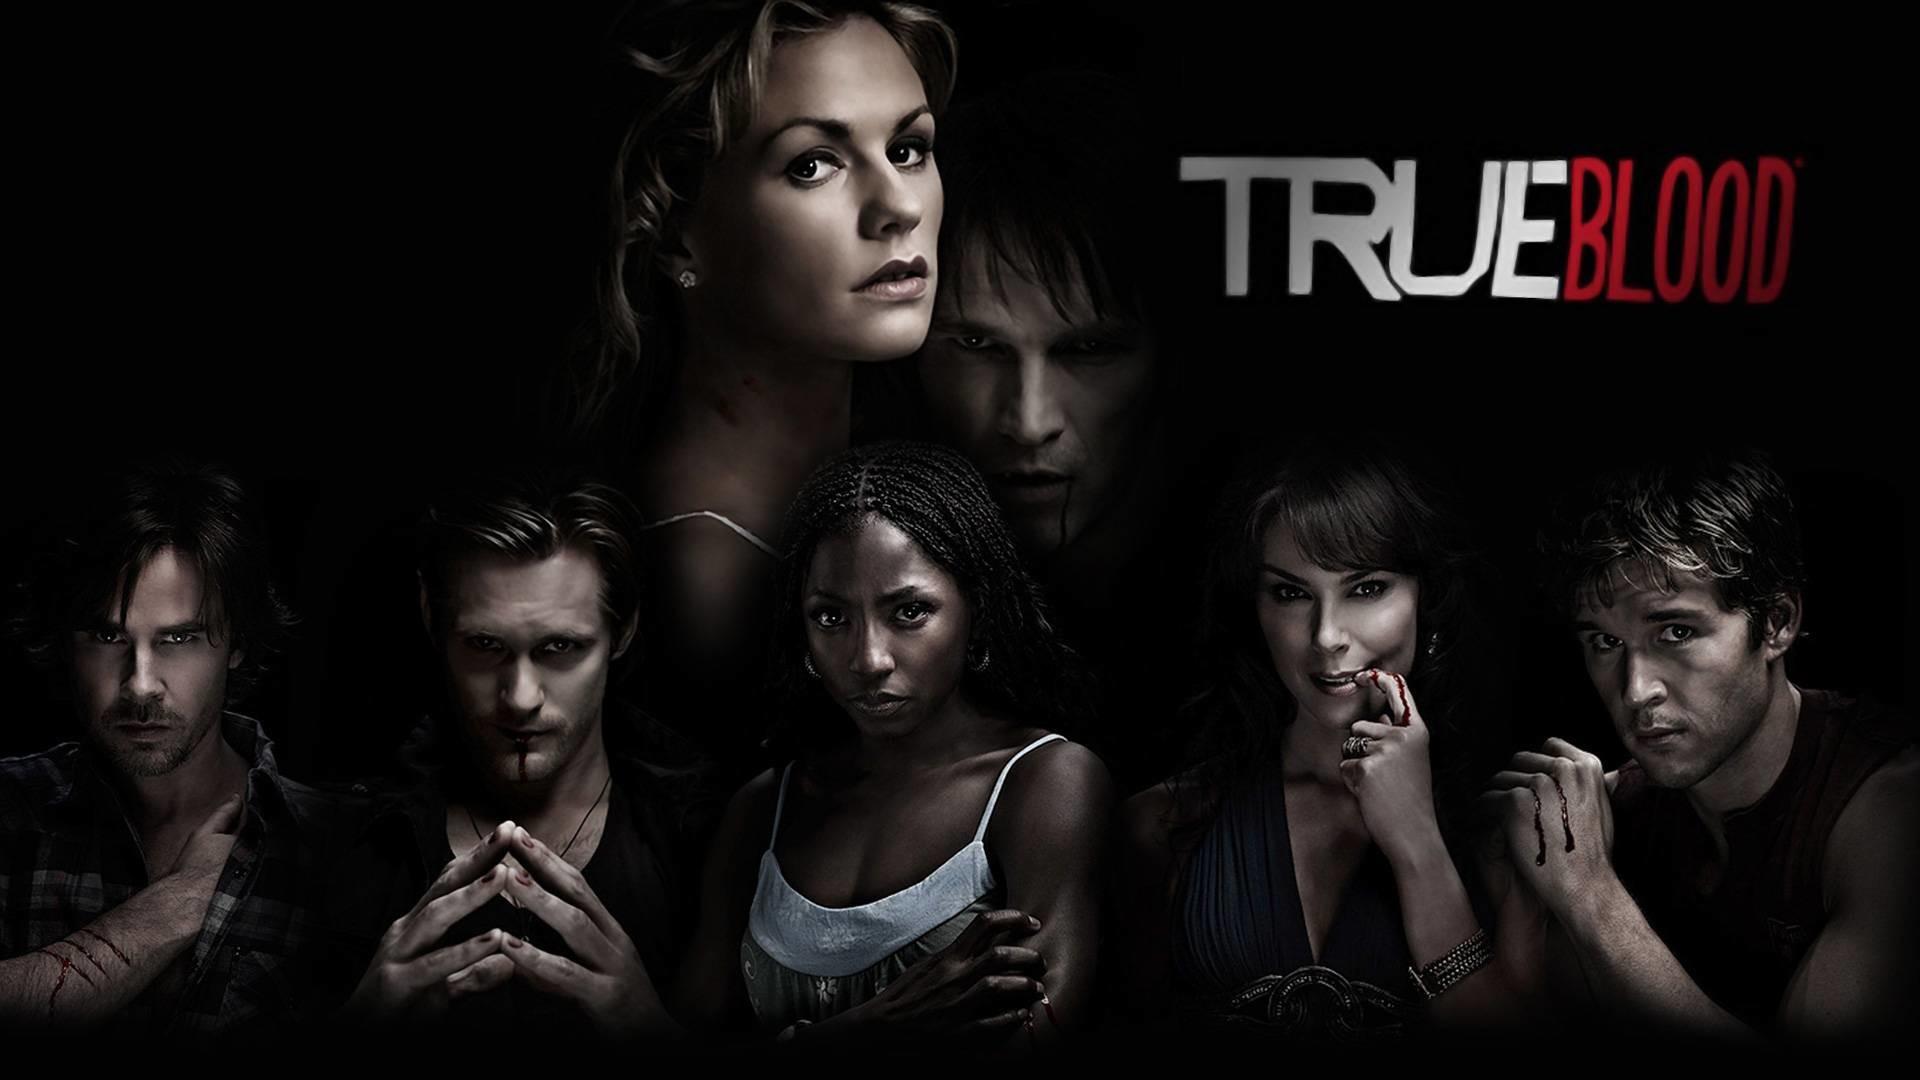 True Blood HD Wallpapers for desktop download